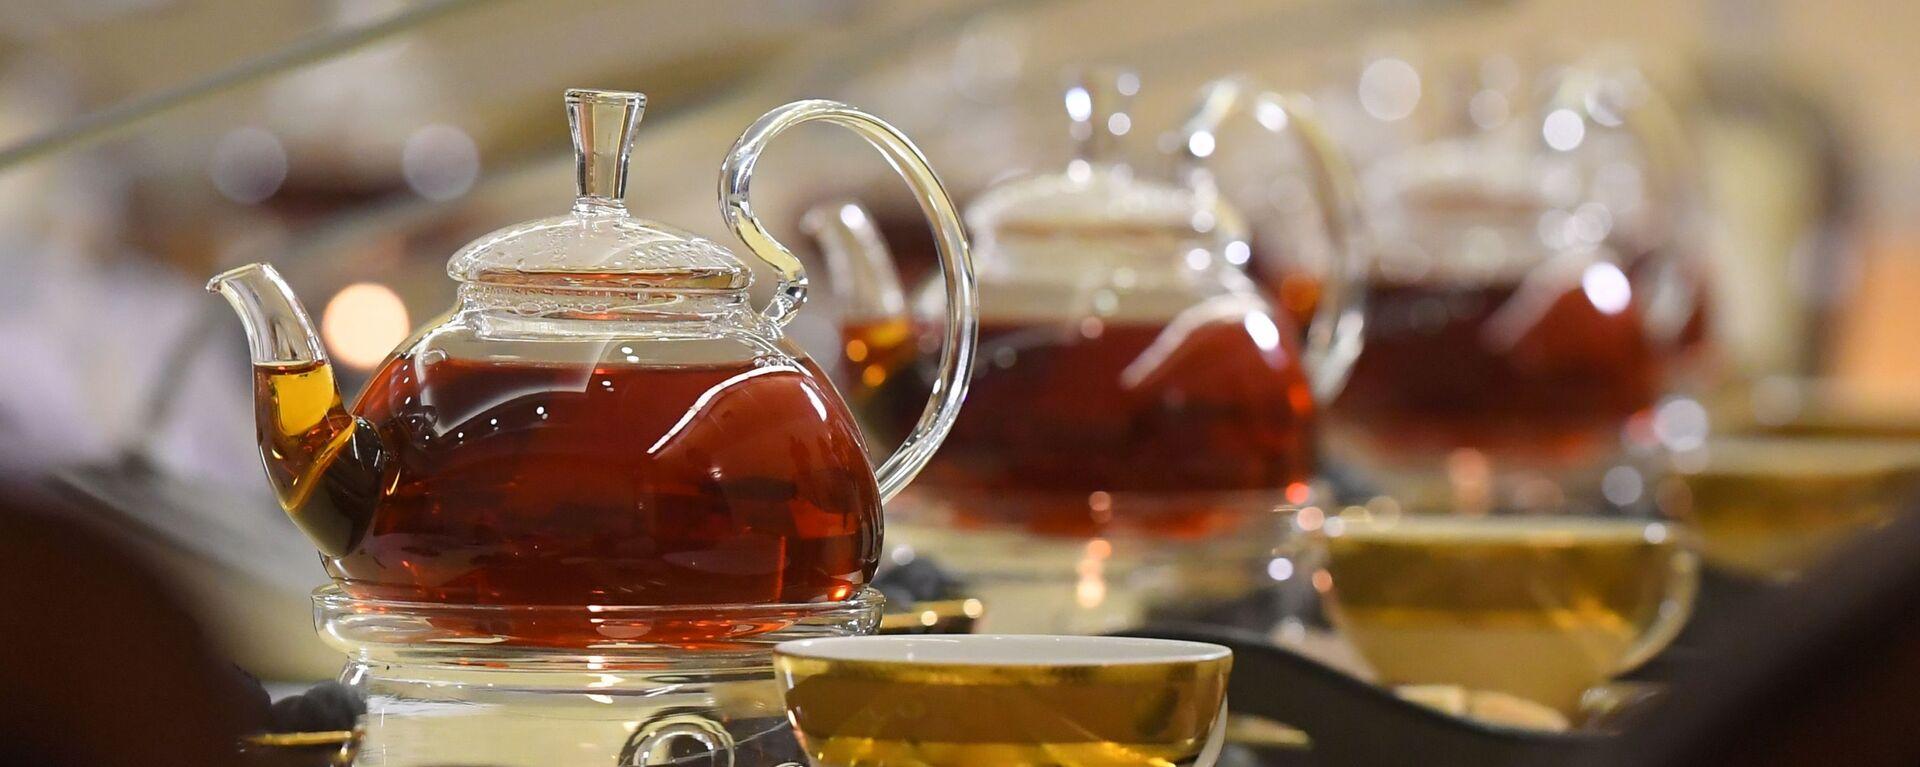 Чайник с чаем. - Sputnik Таджикистан, 1920, 27.08.2020